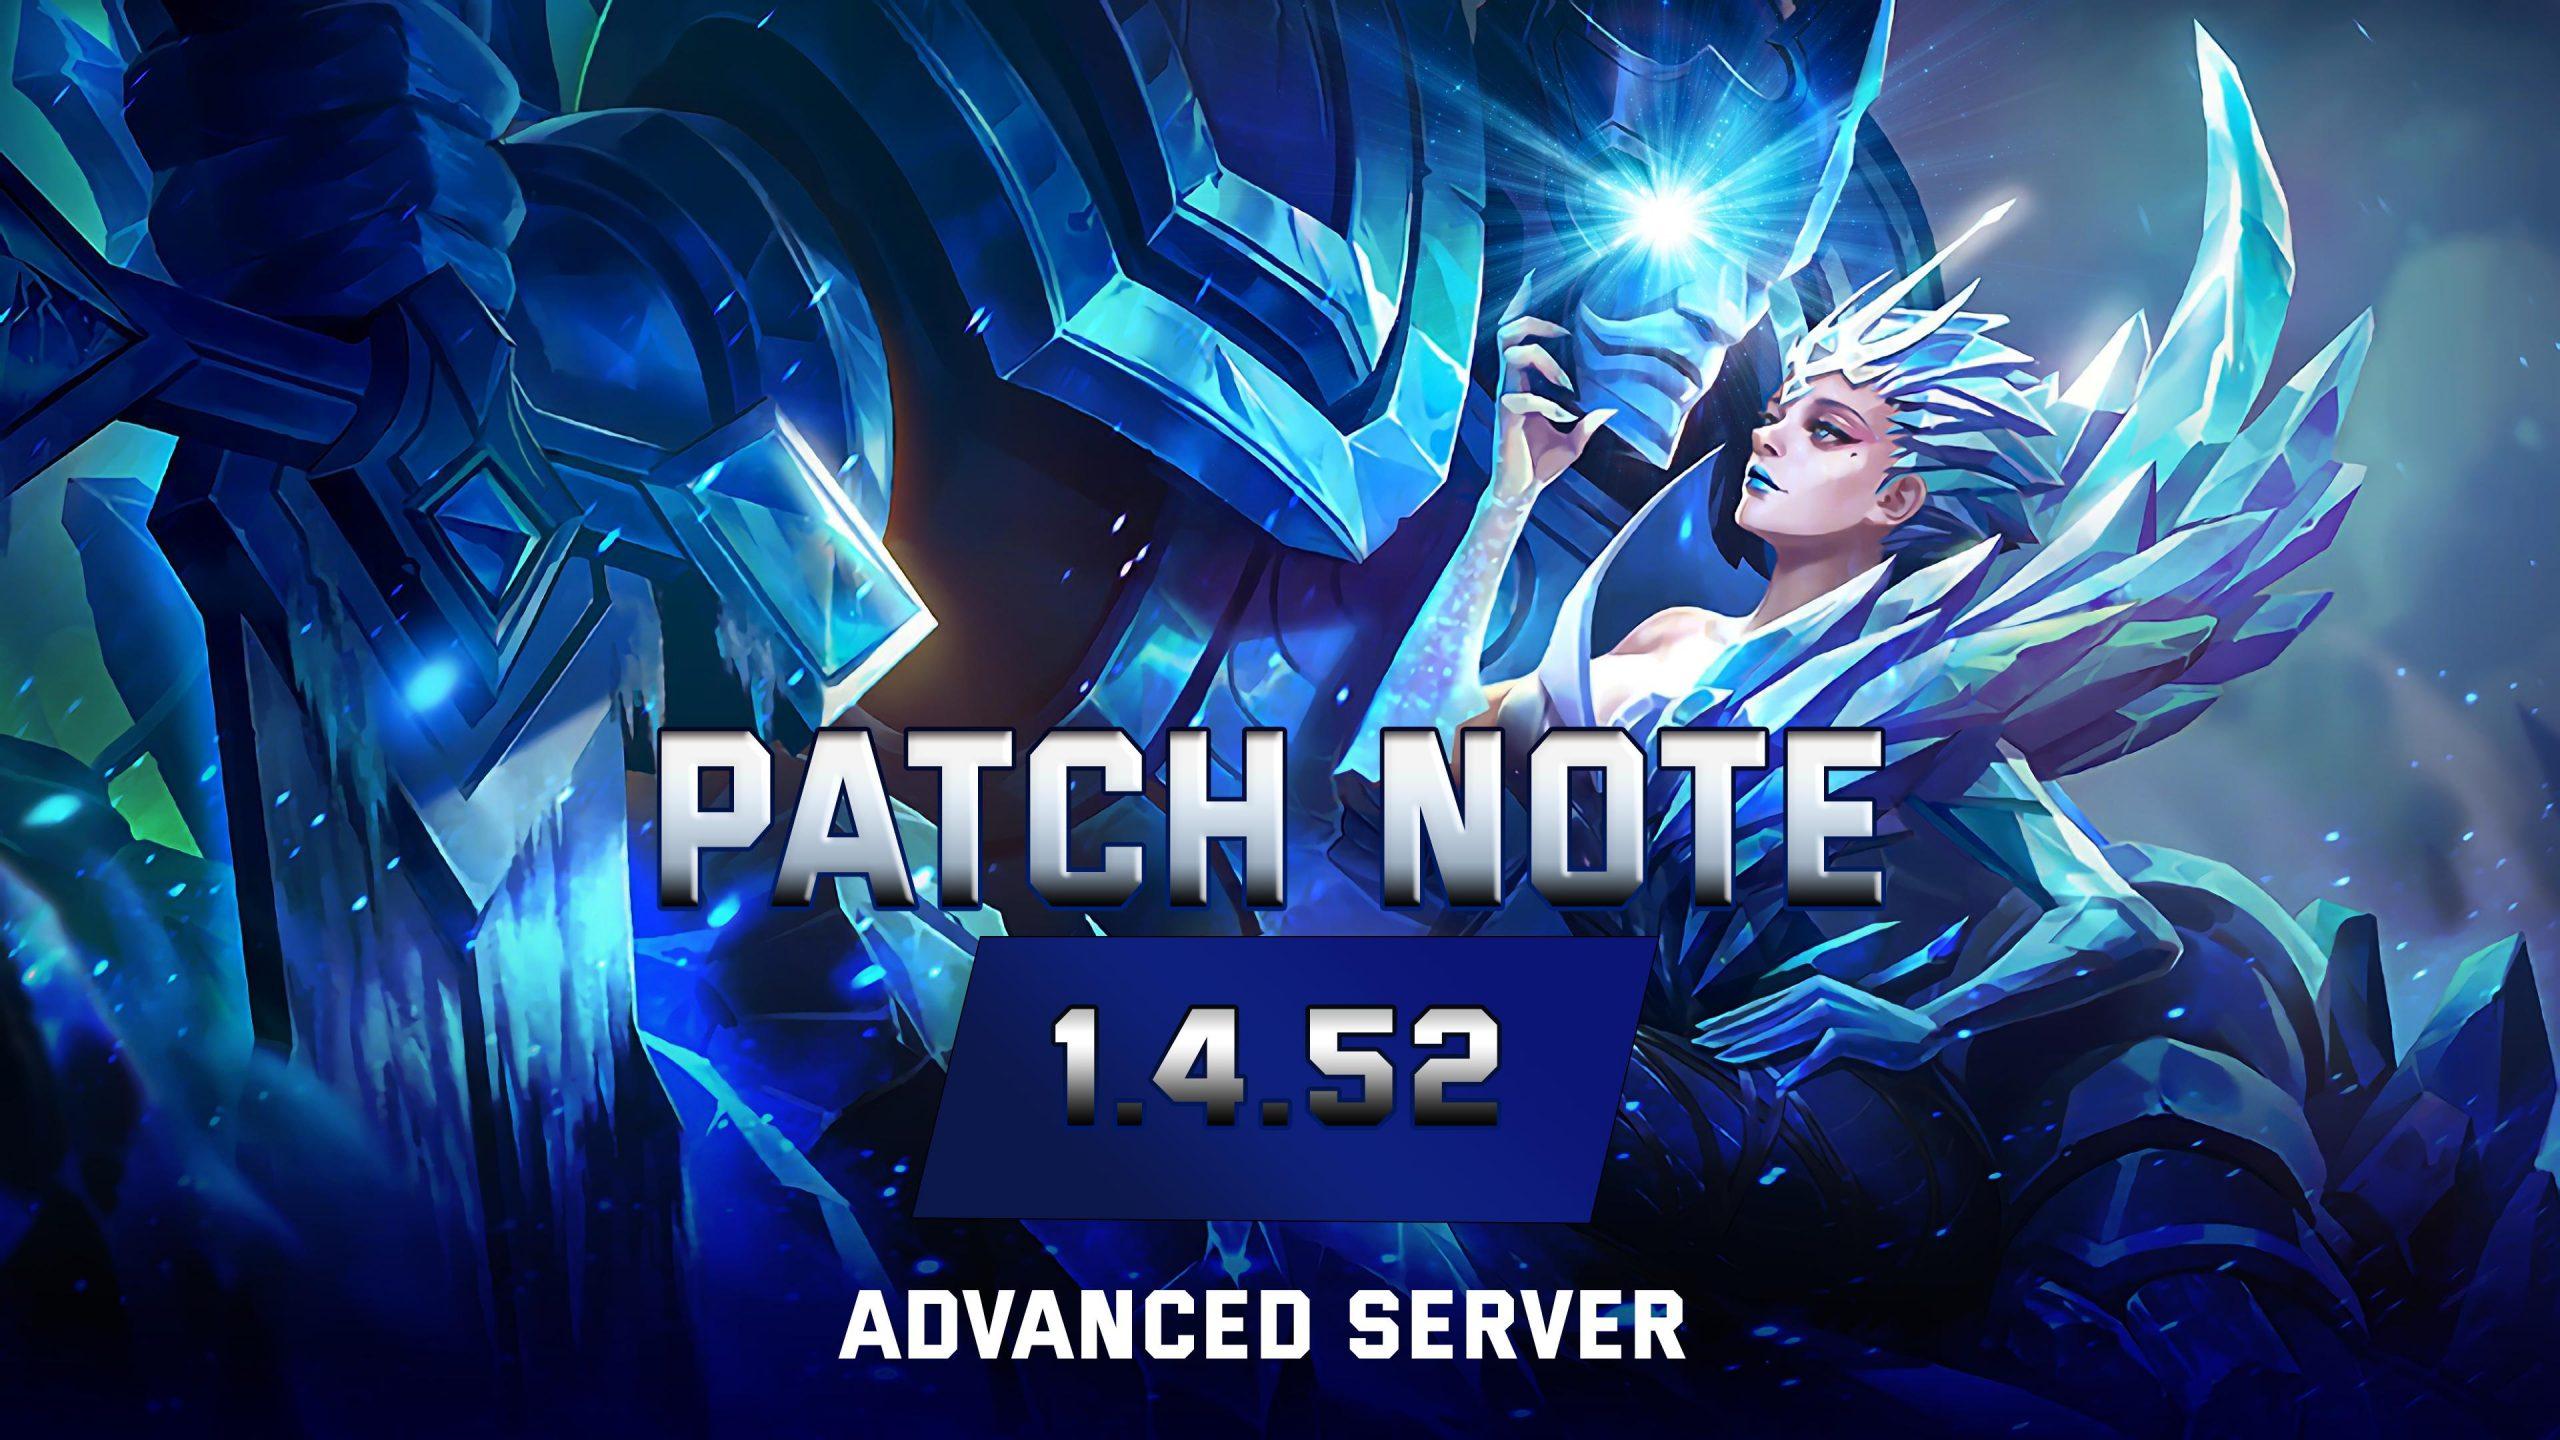 Mobile Legends – 1 4 52 Patch Notes